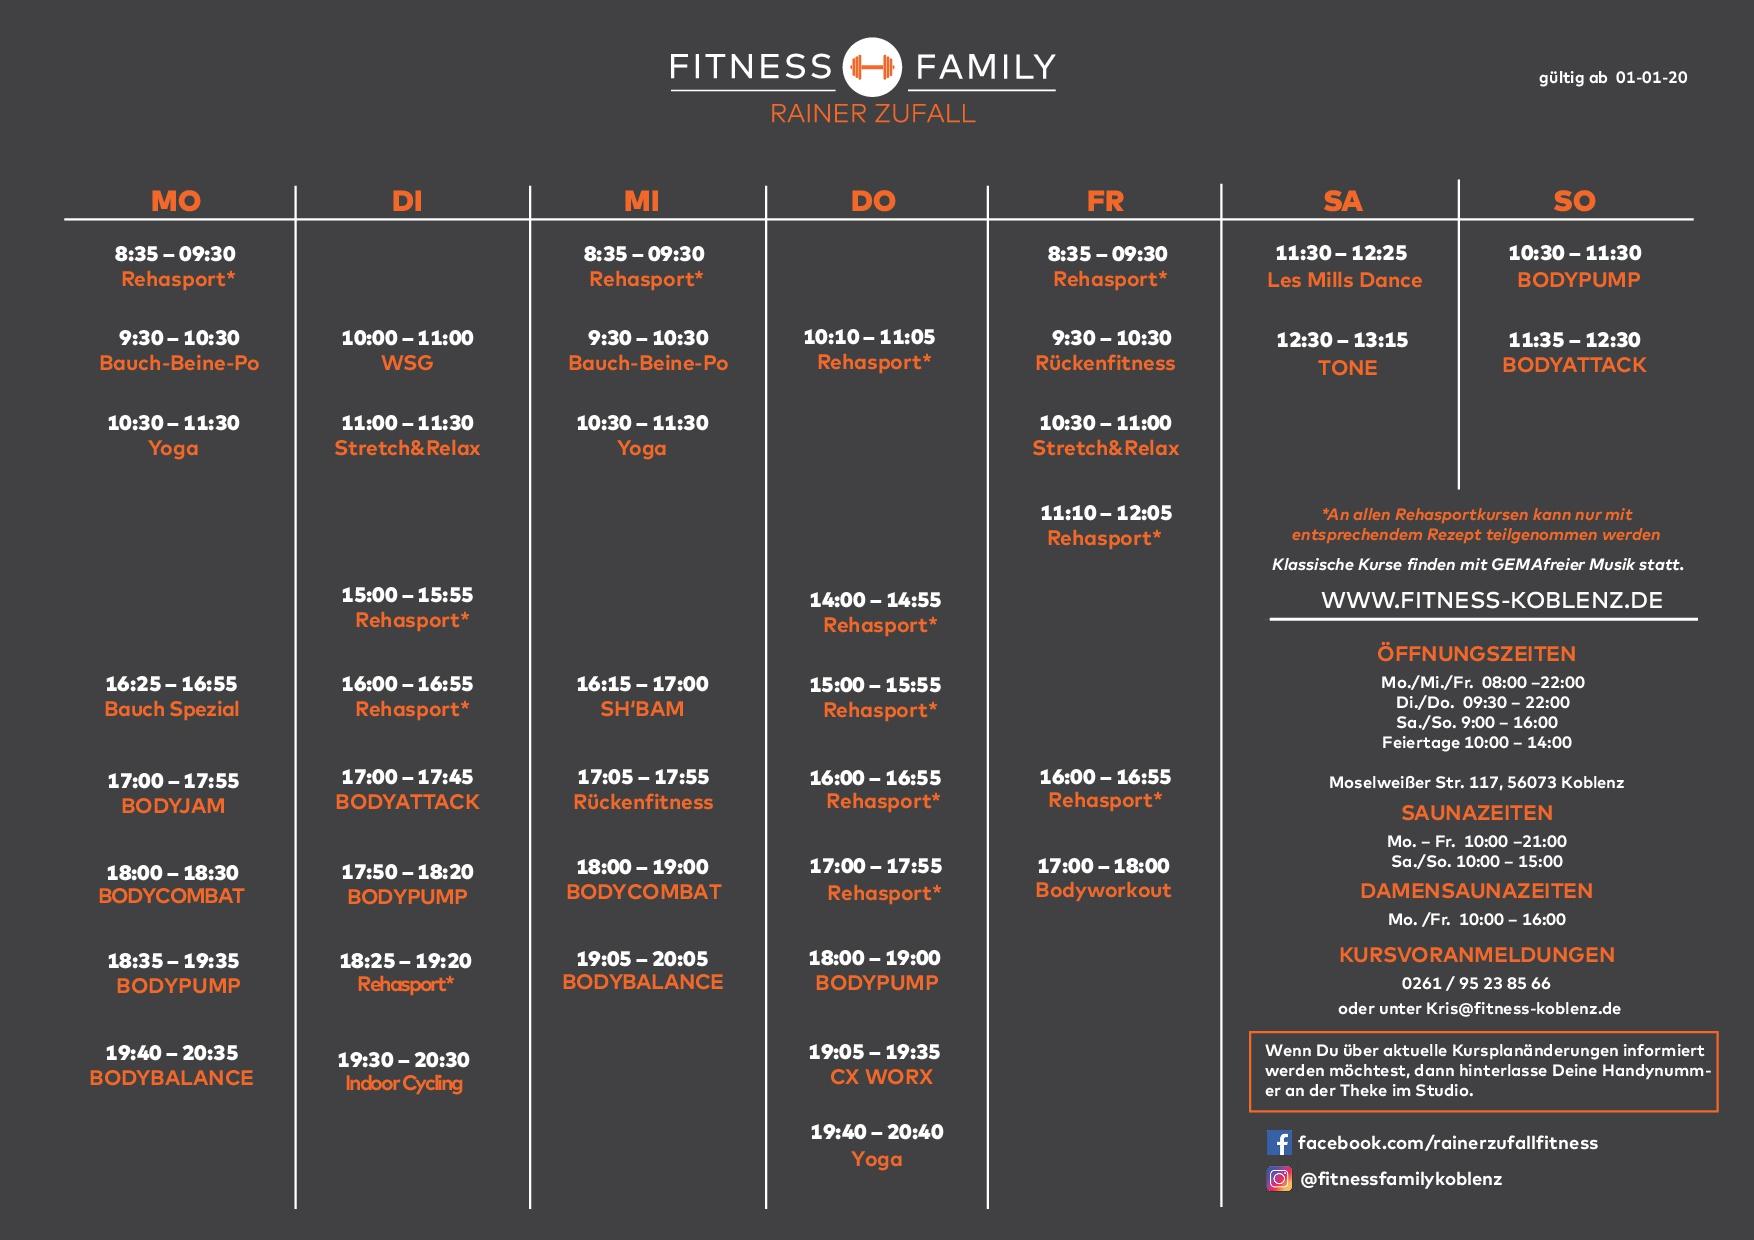 Kursplan Fitness Koblenz Januar 2020